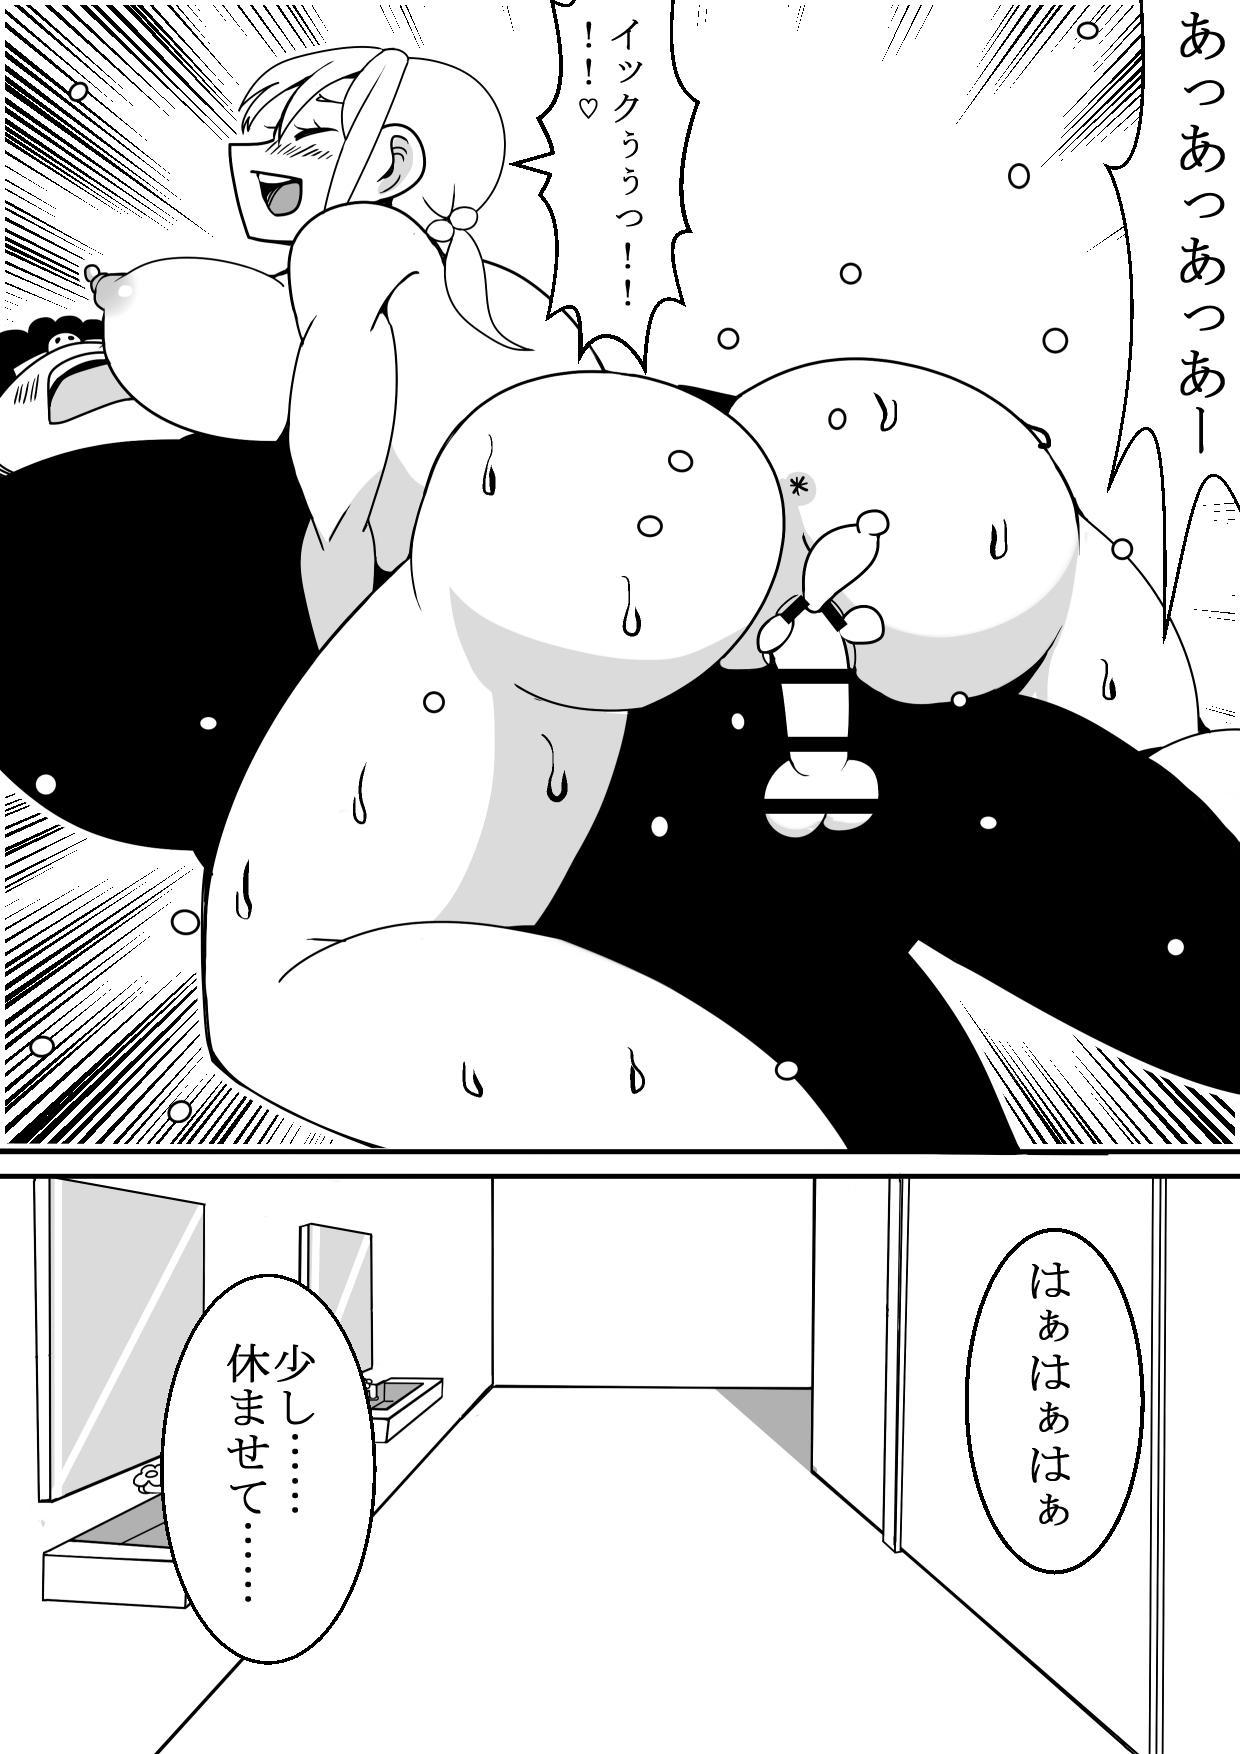 Kawaii JK to Kimoota ga Irekawari Sex 20